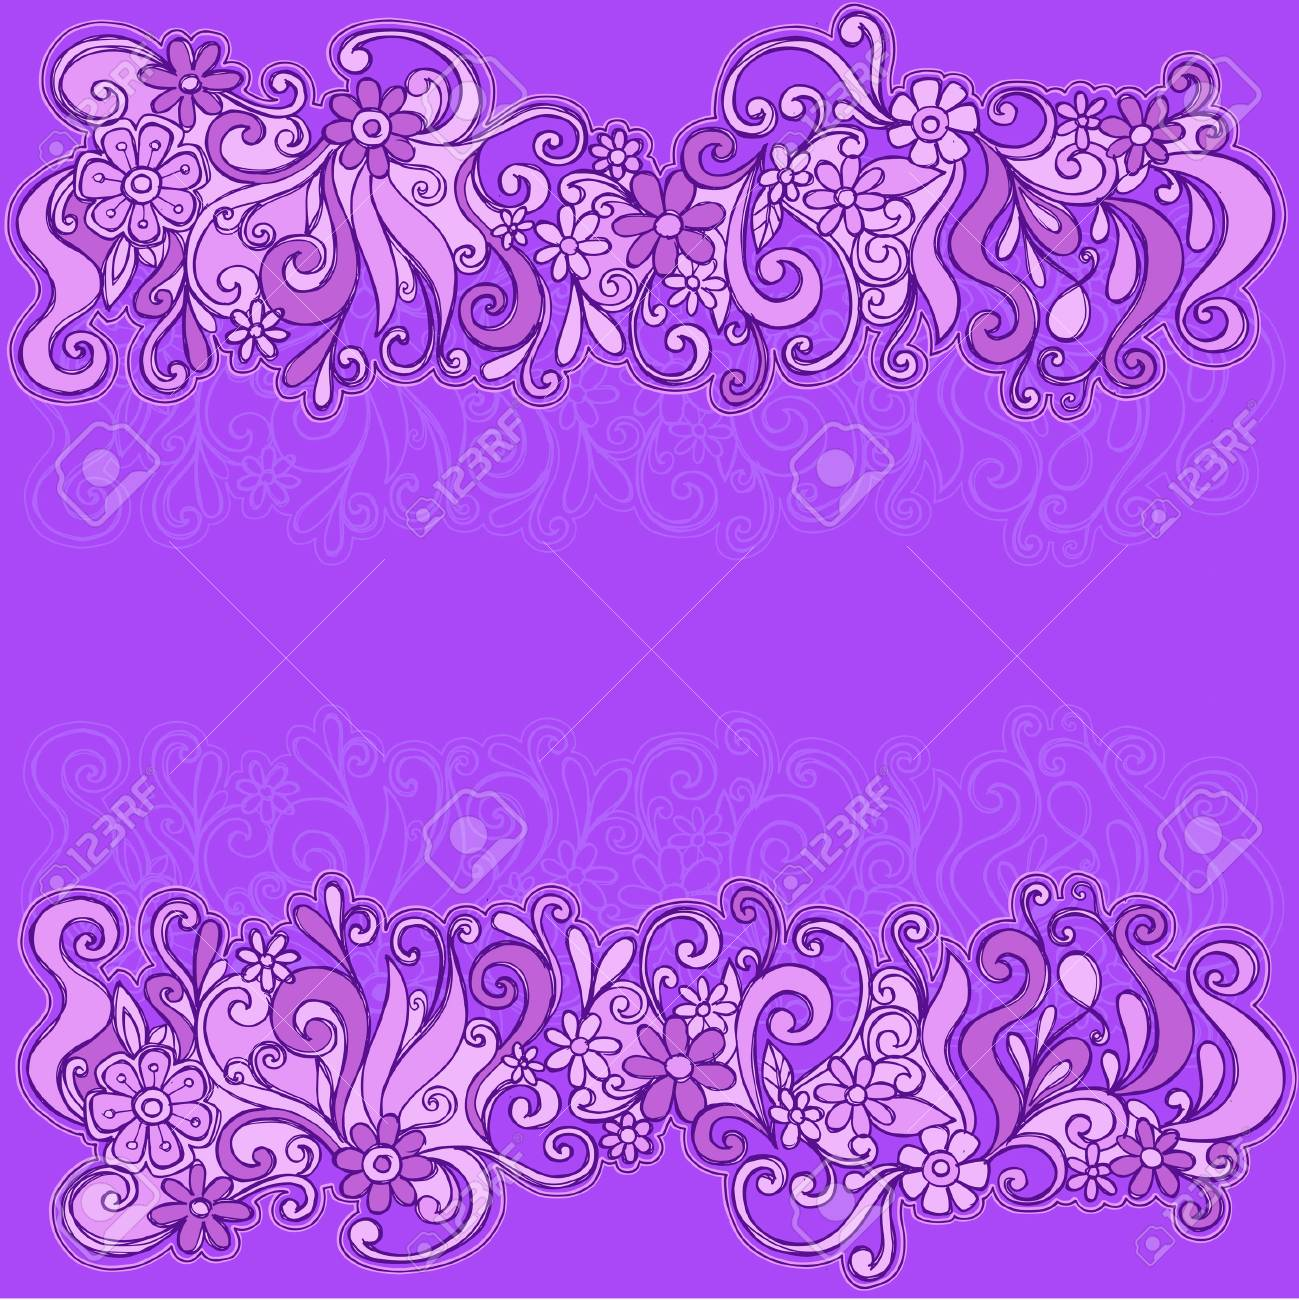 Sketchy Floral Border Vector Illustration Stock Vector - 3683060